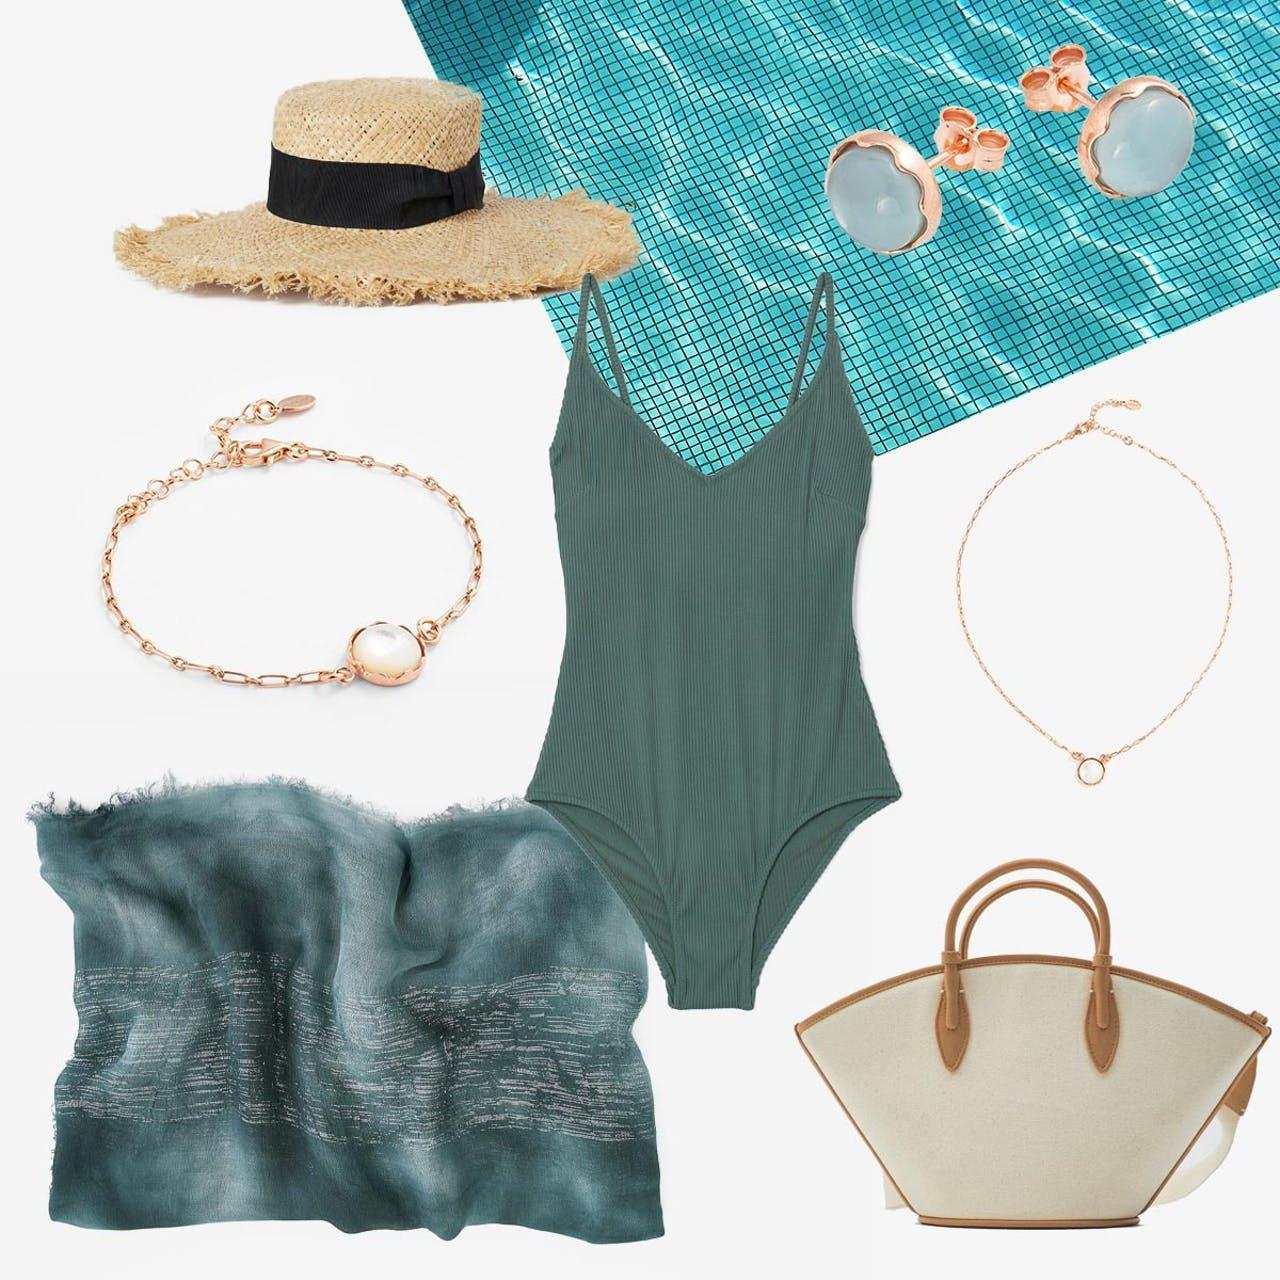 4 Urlaubsziele 4 Styles